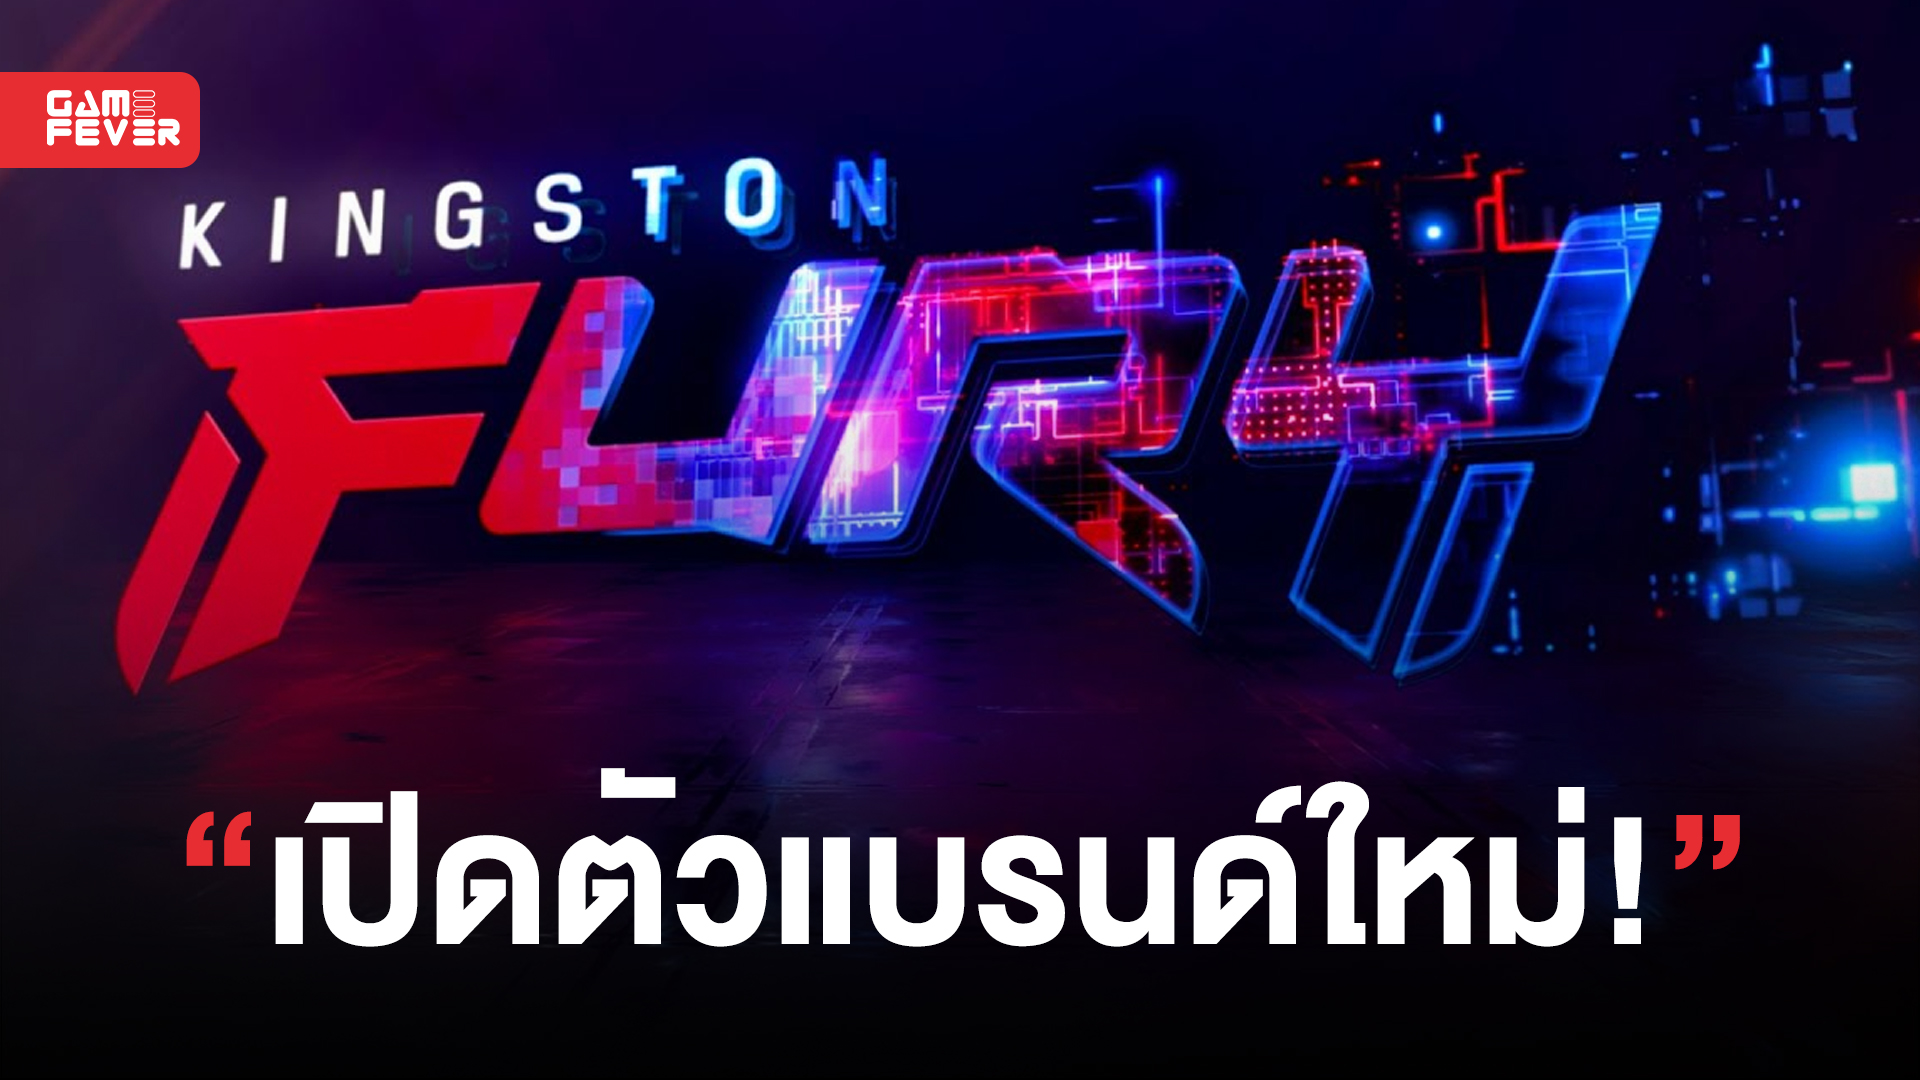 Kingston ประกาศเปิดตัวแบรนด์ Fury ใหม่ ซึ่งจะเข้ามาแทนที่ HyperX